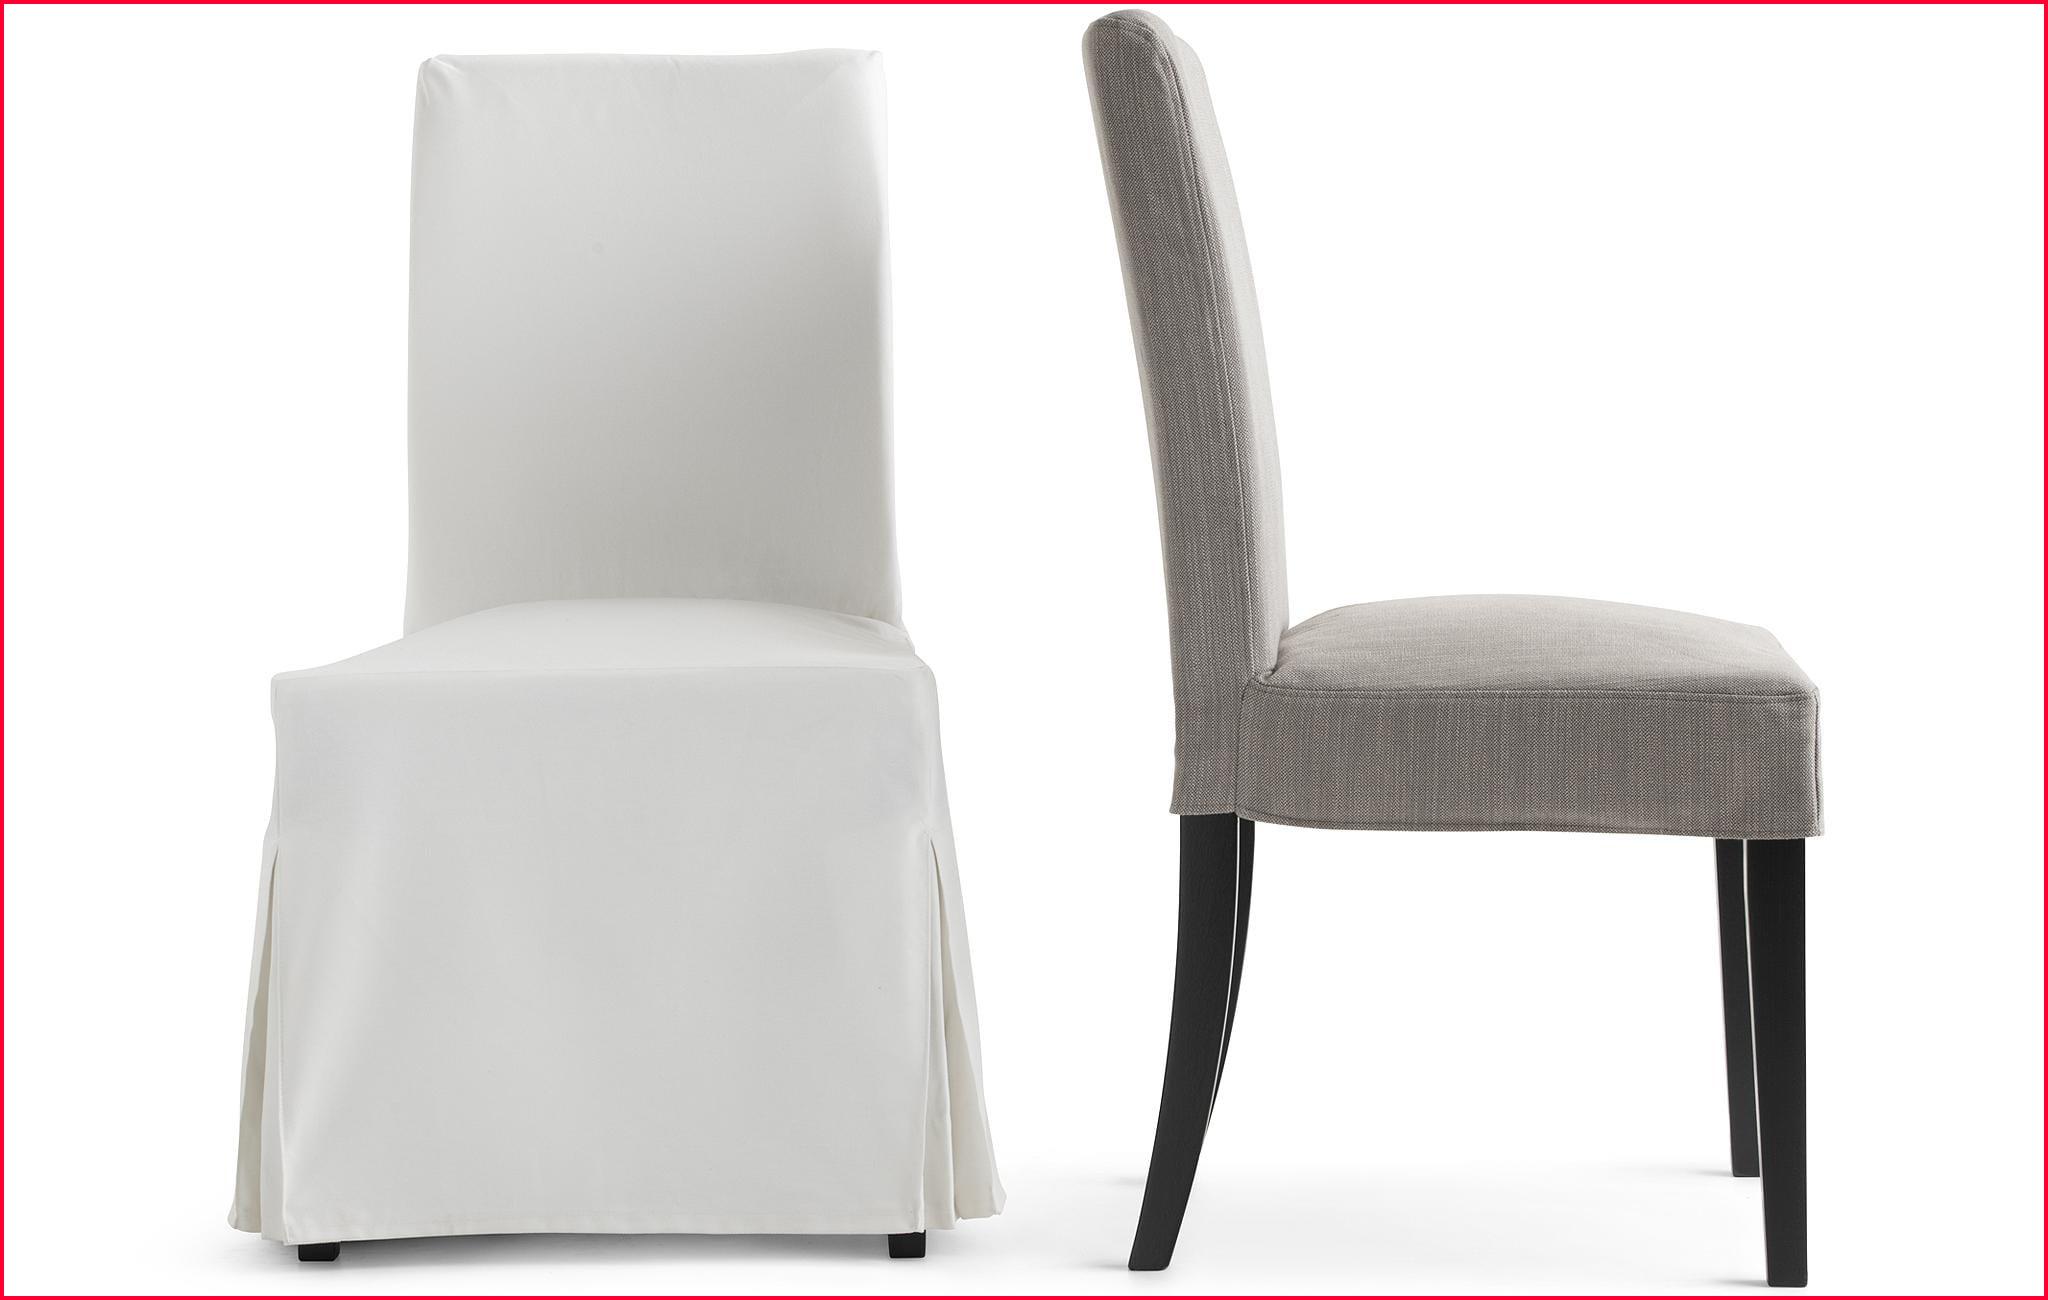 Ikea Sillas Niños Fmdf Fundas Silla Ikea Fundas Para Sillas De Edor Decoracià N